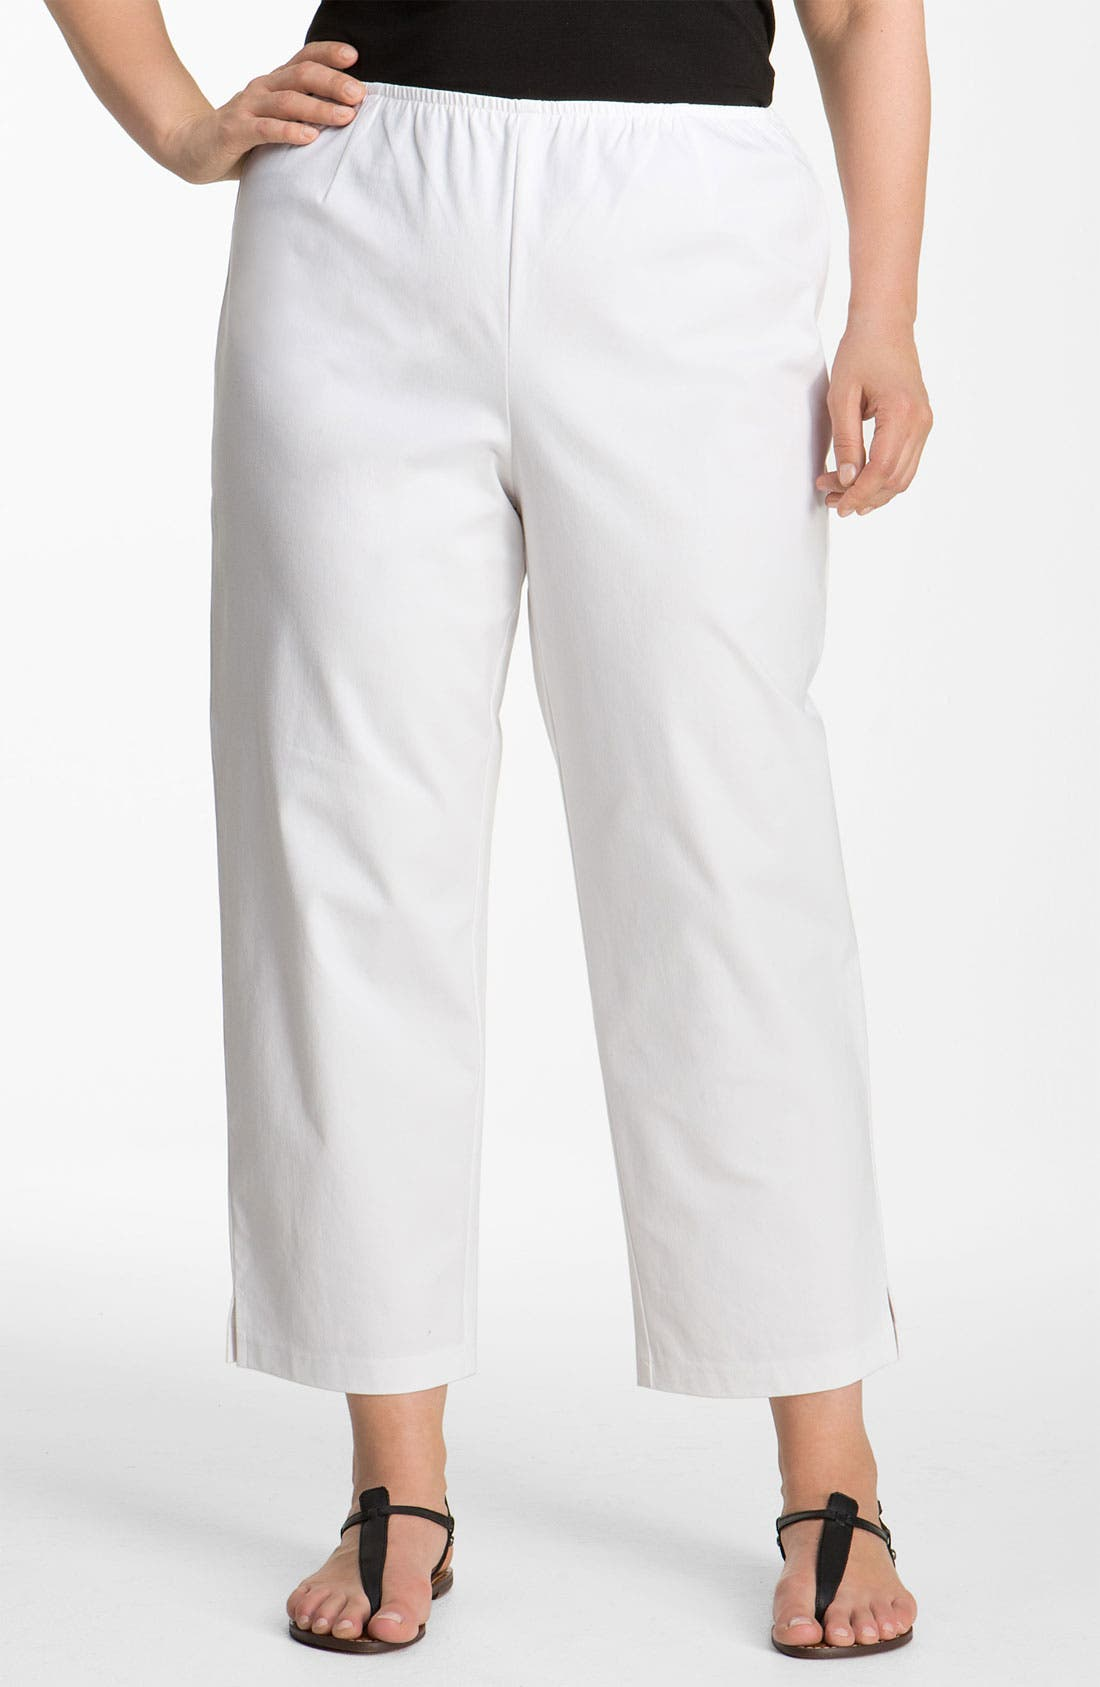 Stretch Organic Cotton Ankle Pants,                             Main thumbnail 1, color,                             White